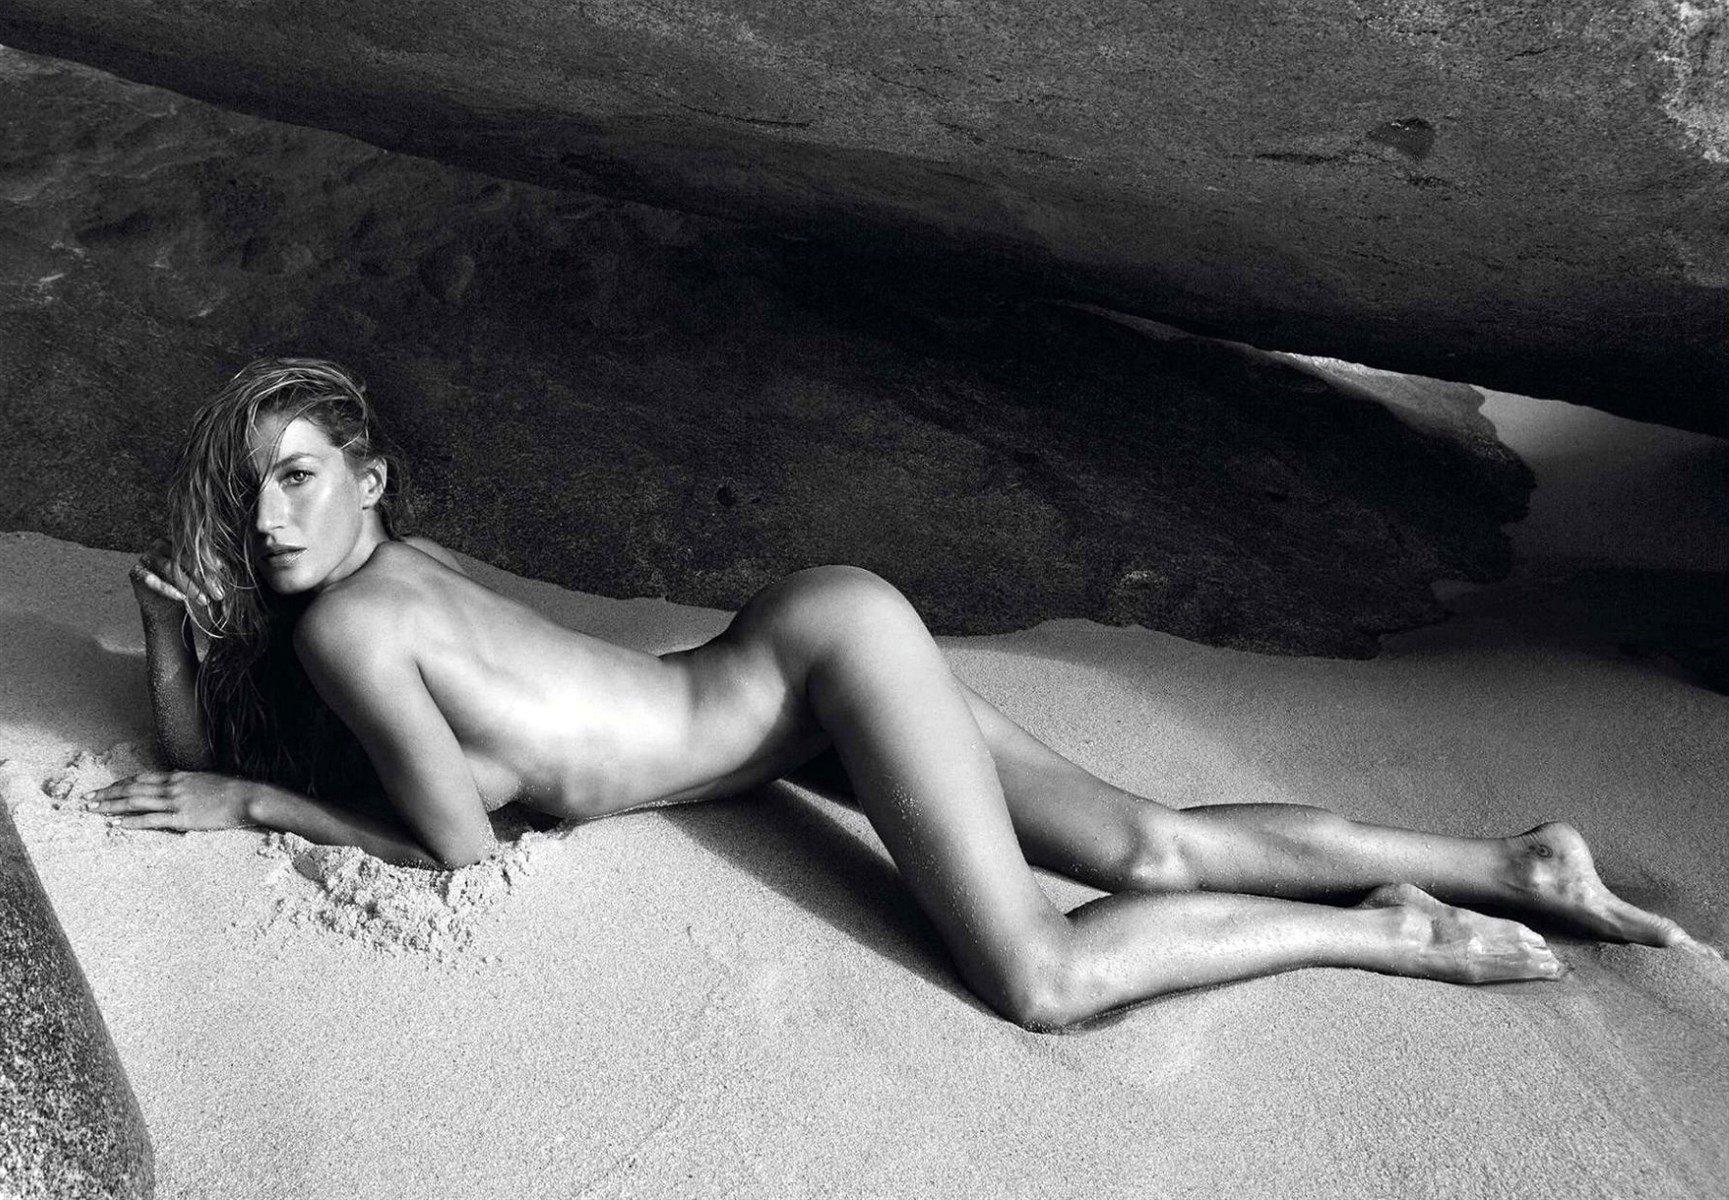 Gisele Bundchen Nude Photo Collection